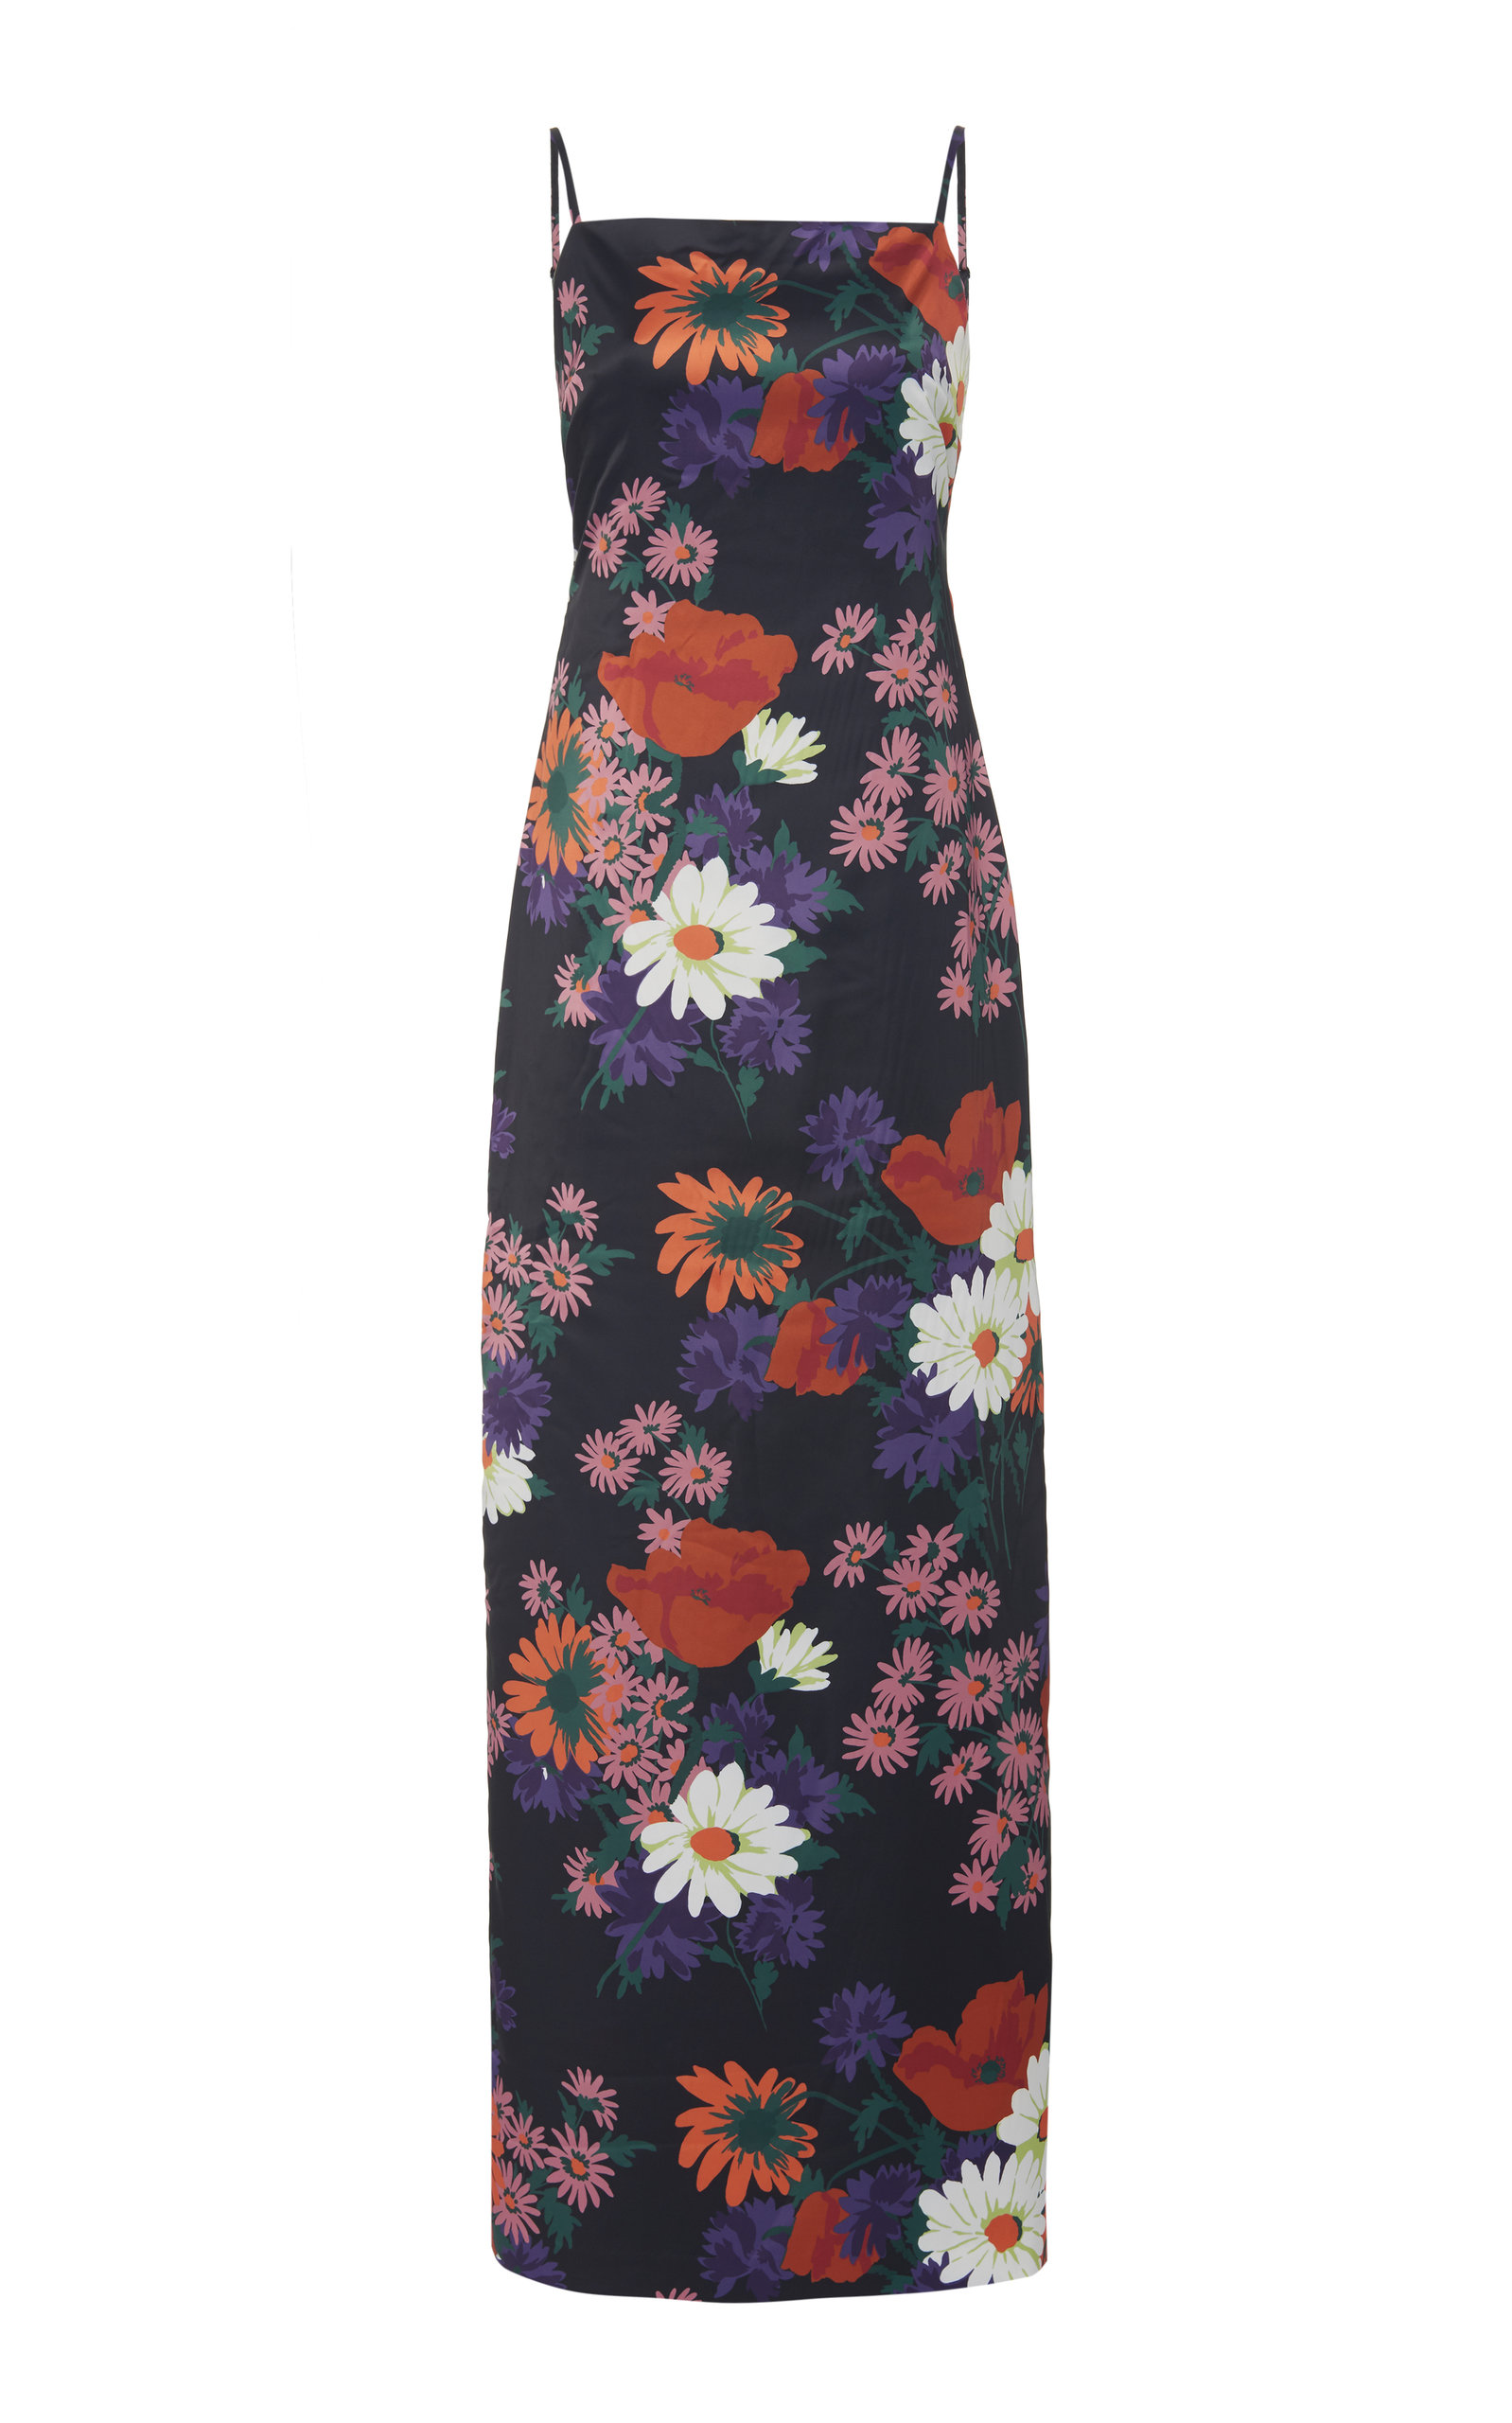 Heidi Floral Jacquard Maxi Dress by Staud